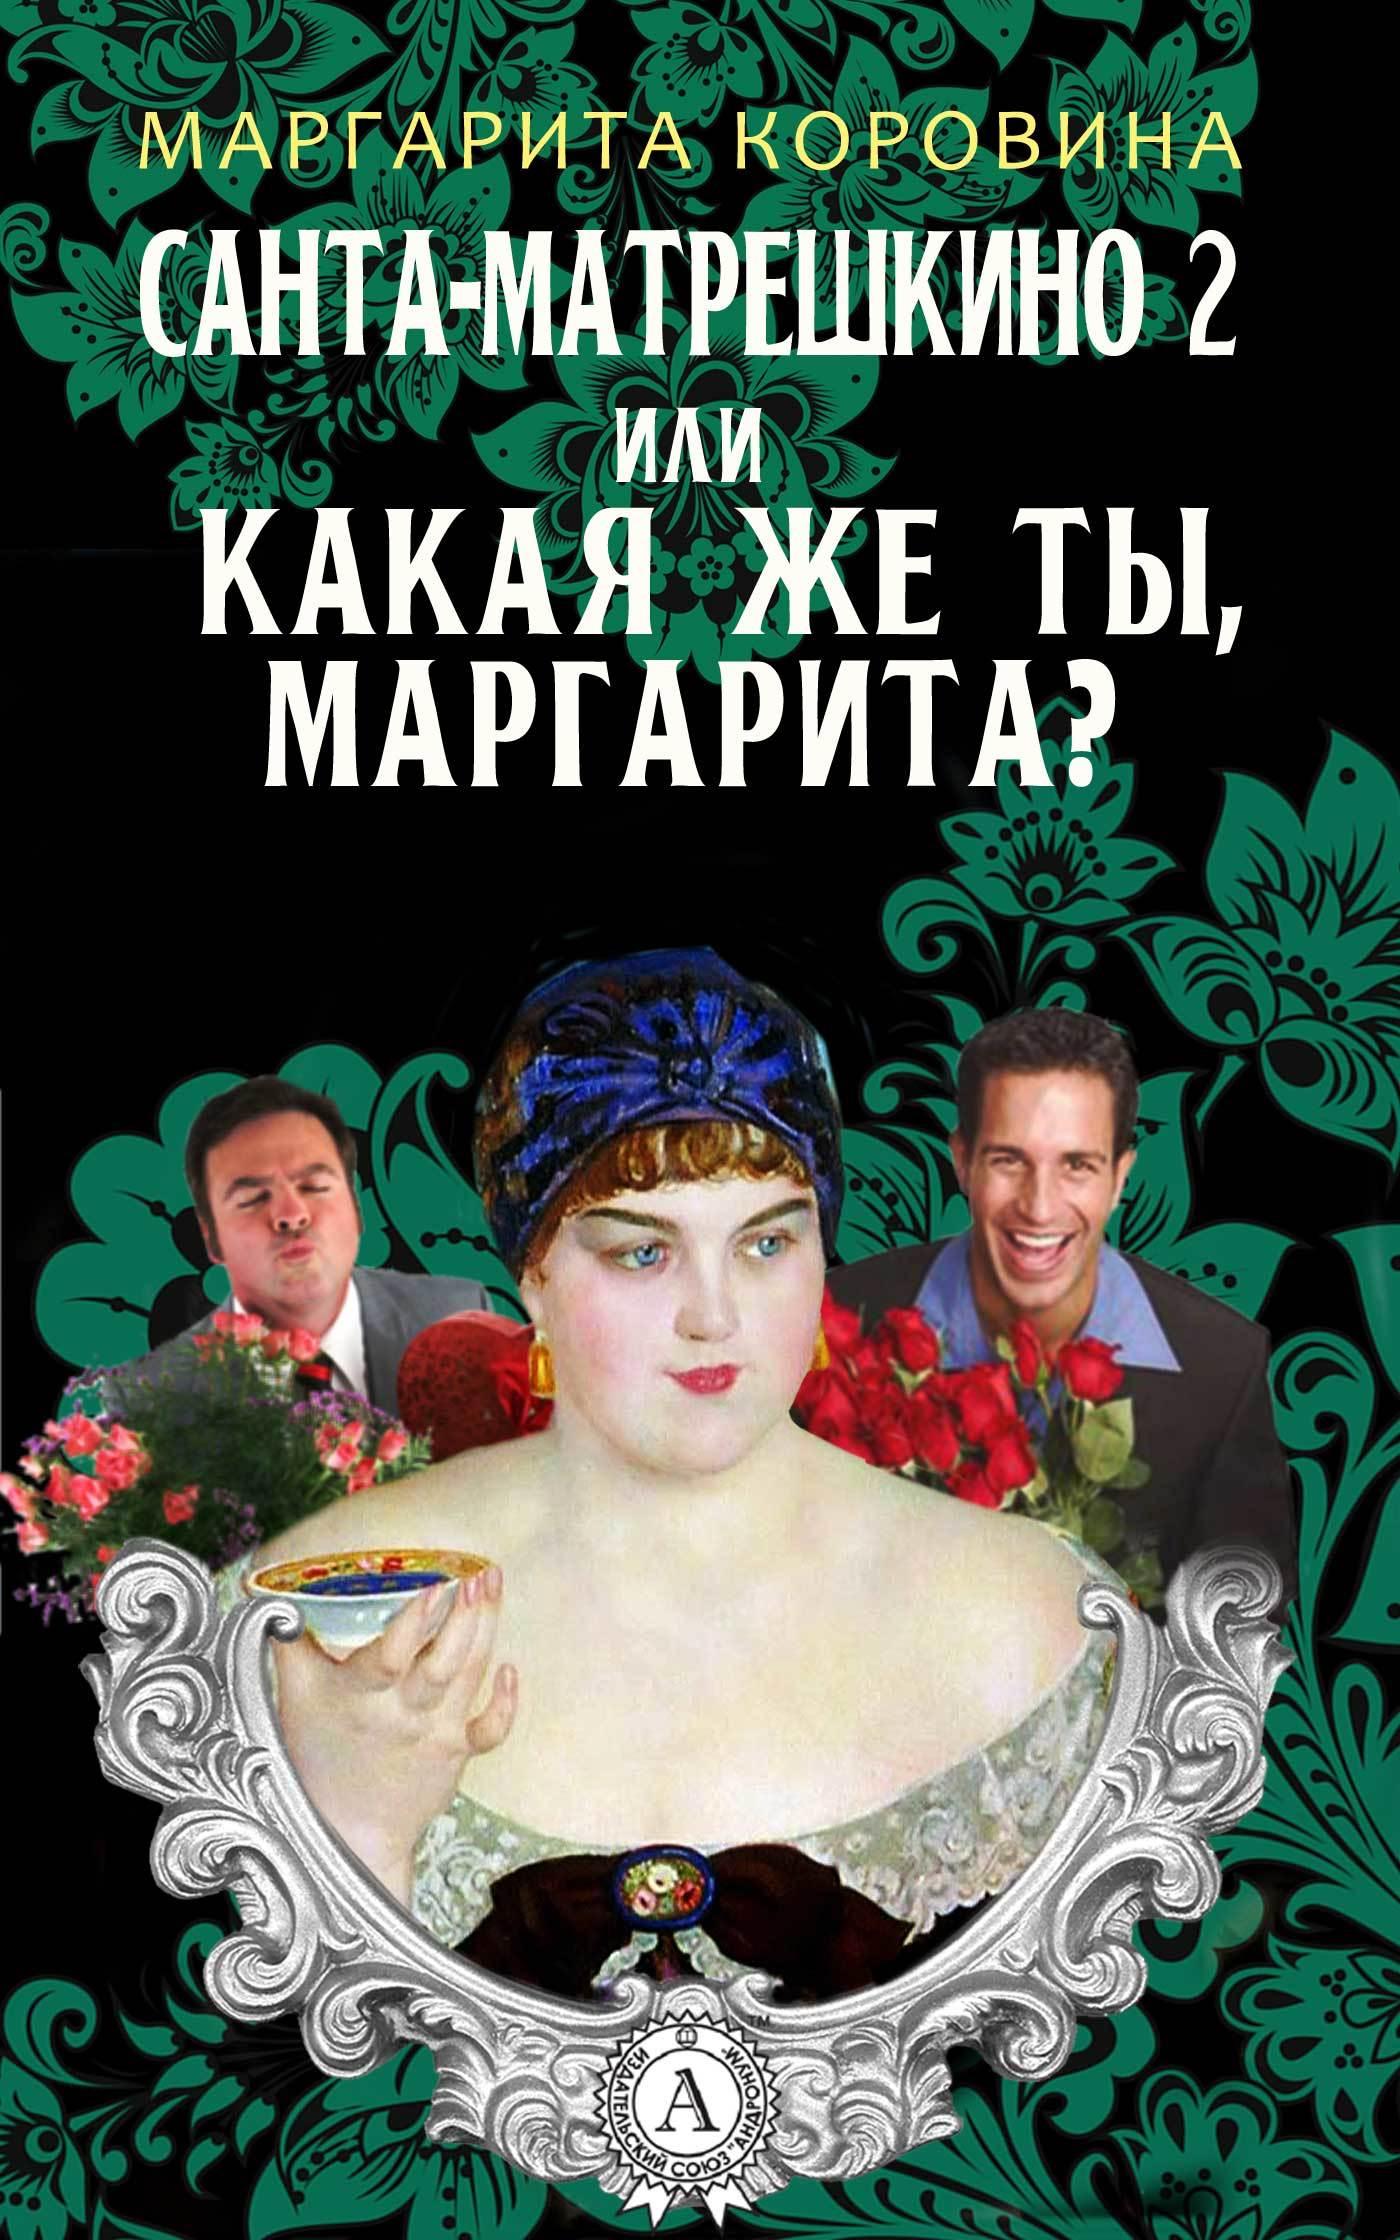 Маргарита Коровина Санта-Матрешкино – 2, или Какая же ты, Маргарита? давыдова маргарита алексеевна праздник в школе 1 5кл